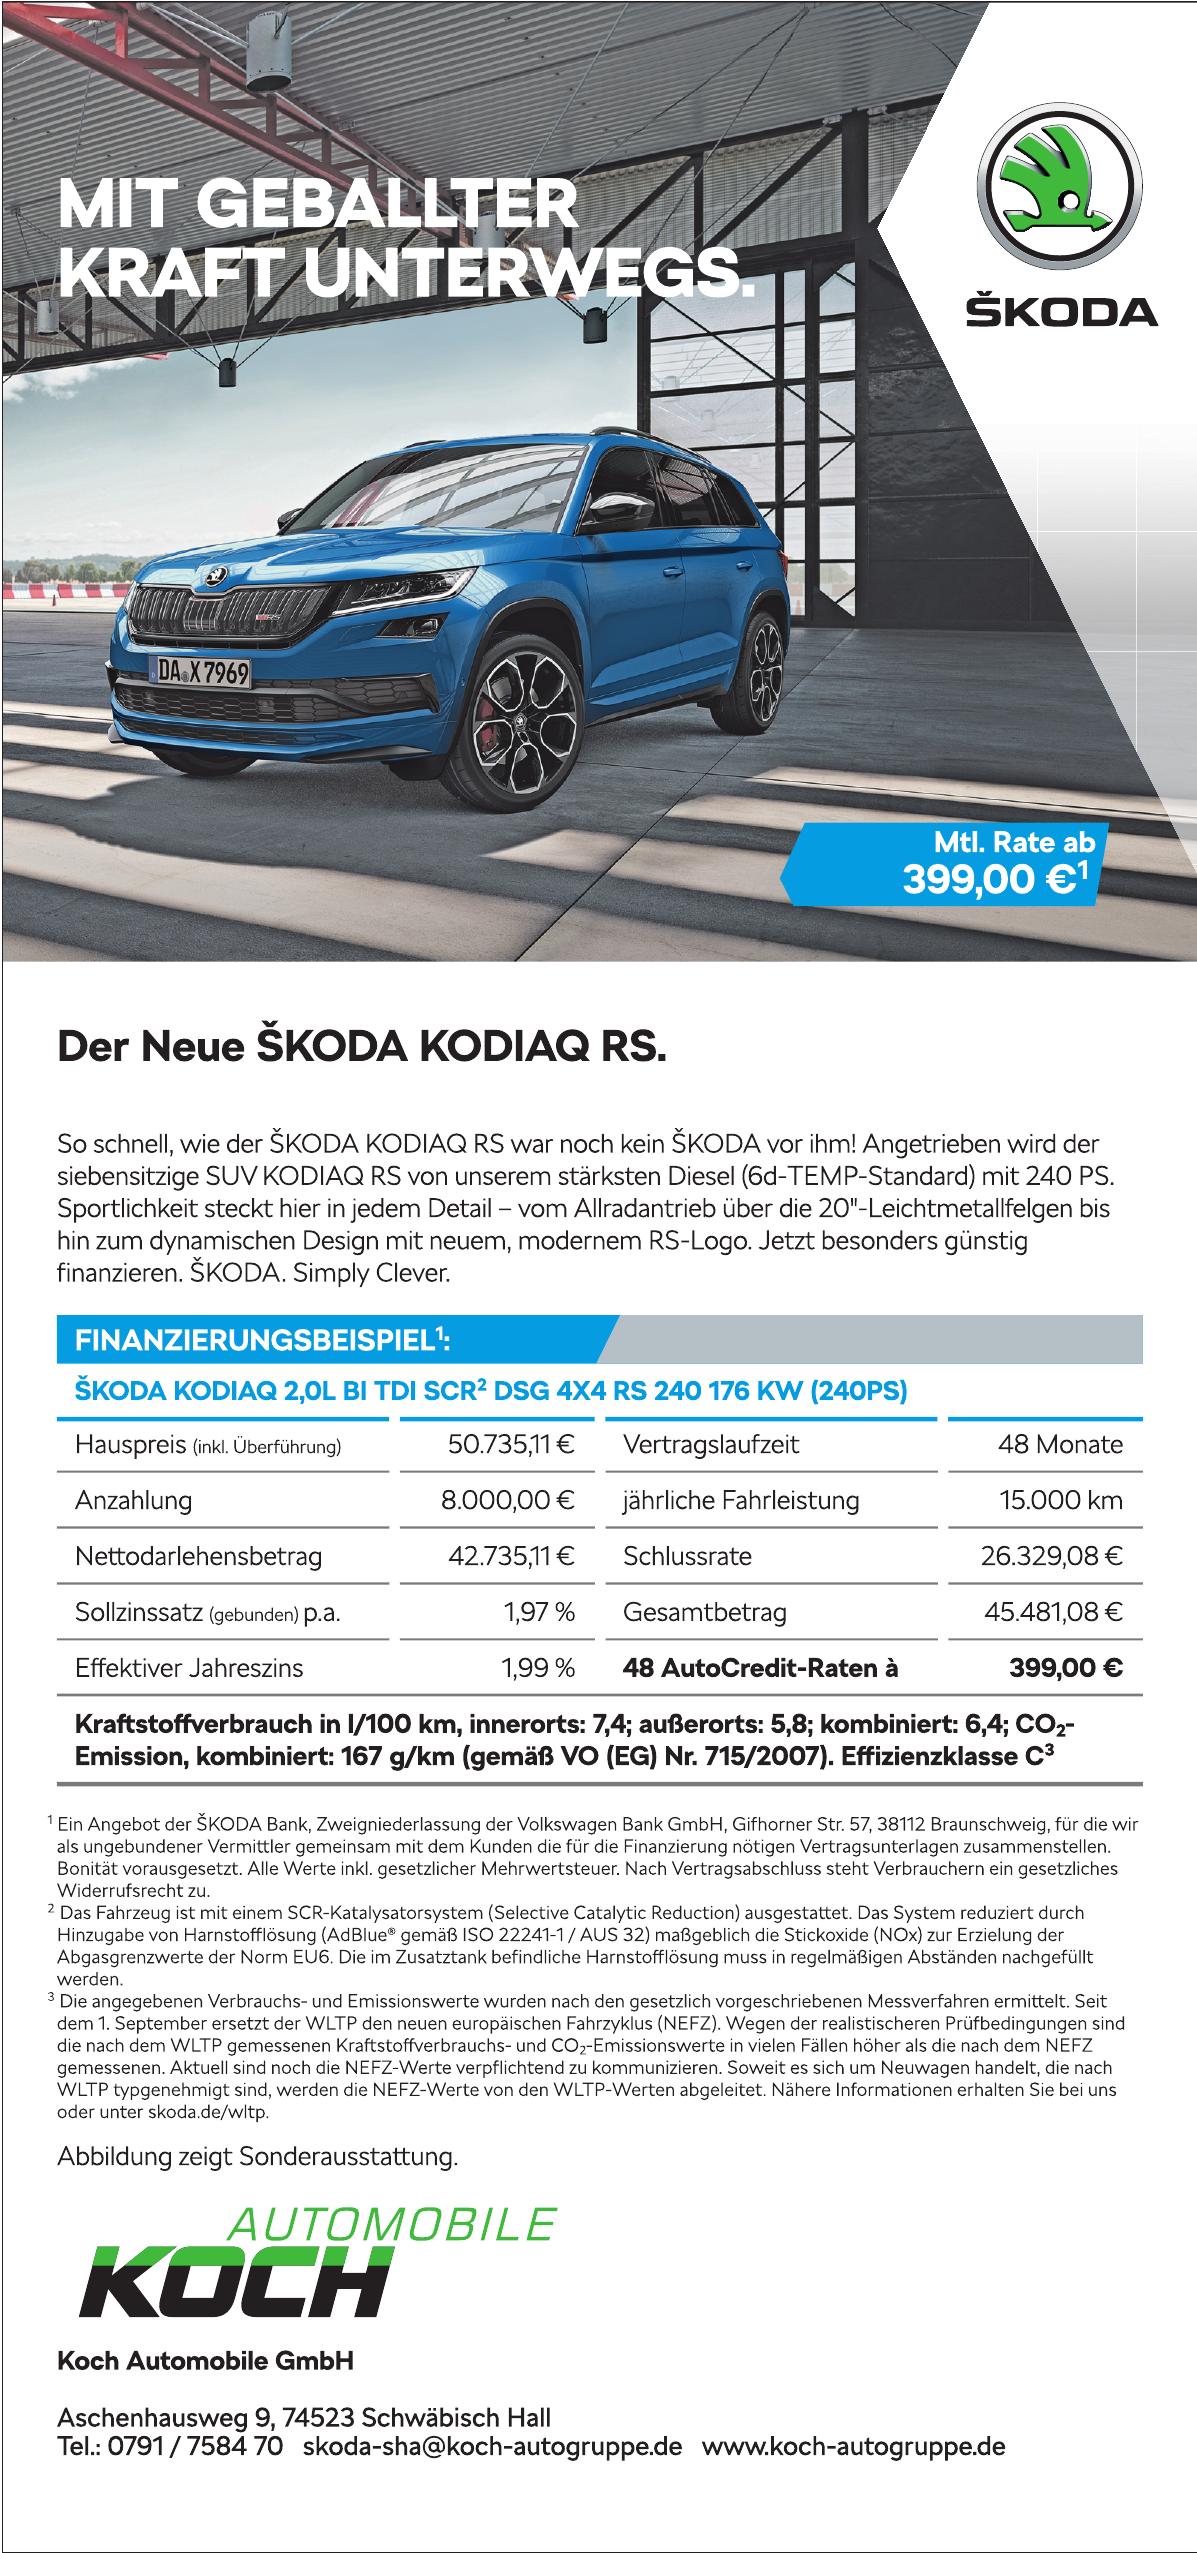 Koch Automobile GmbH